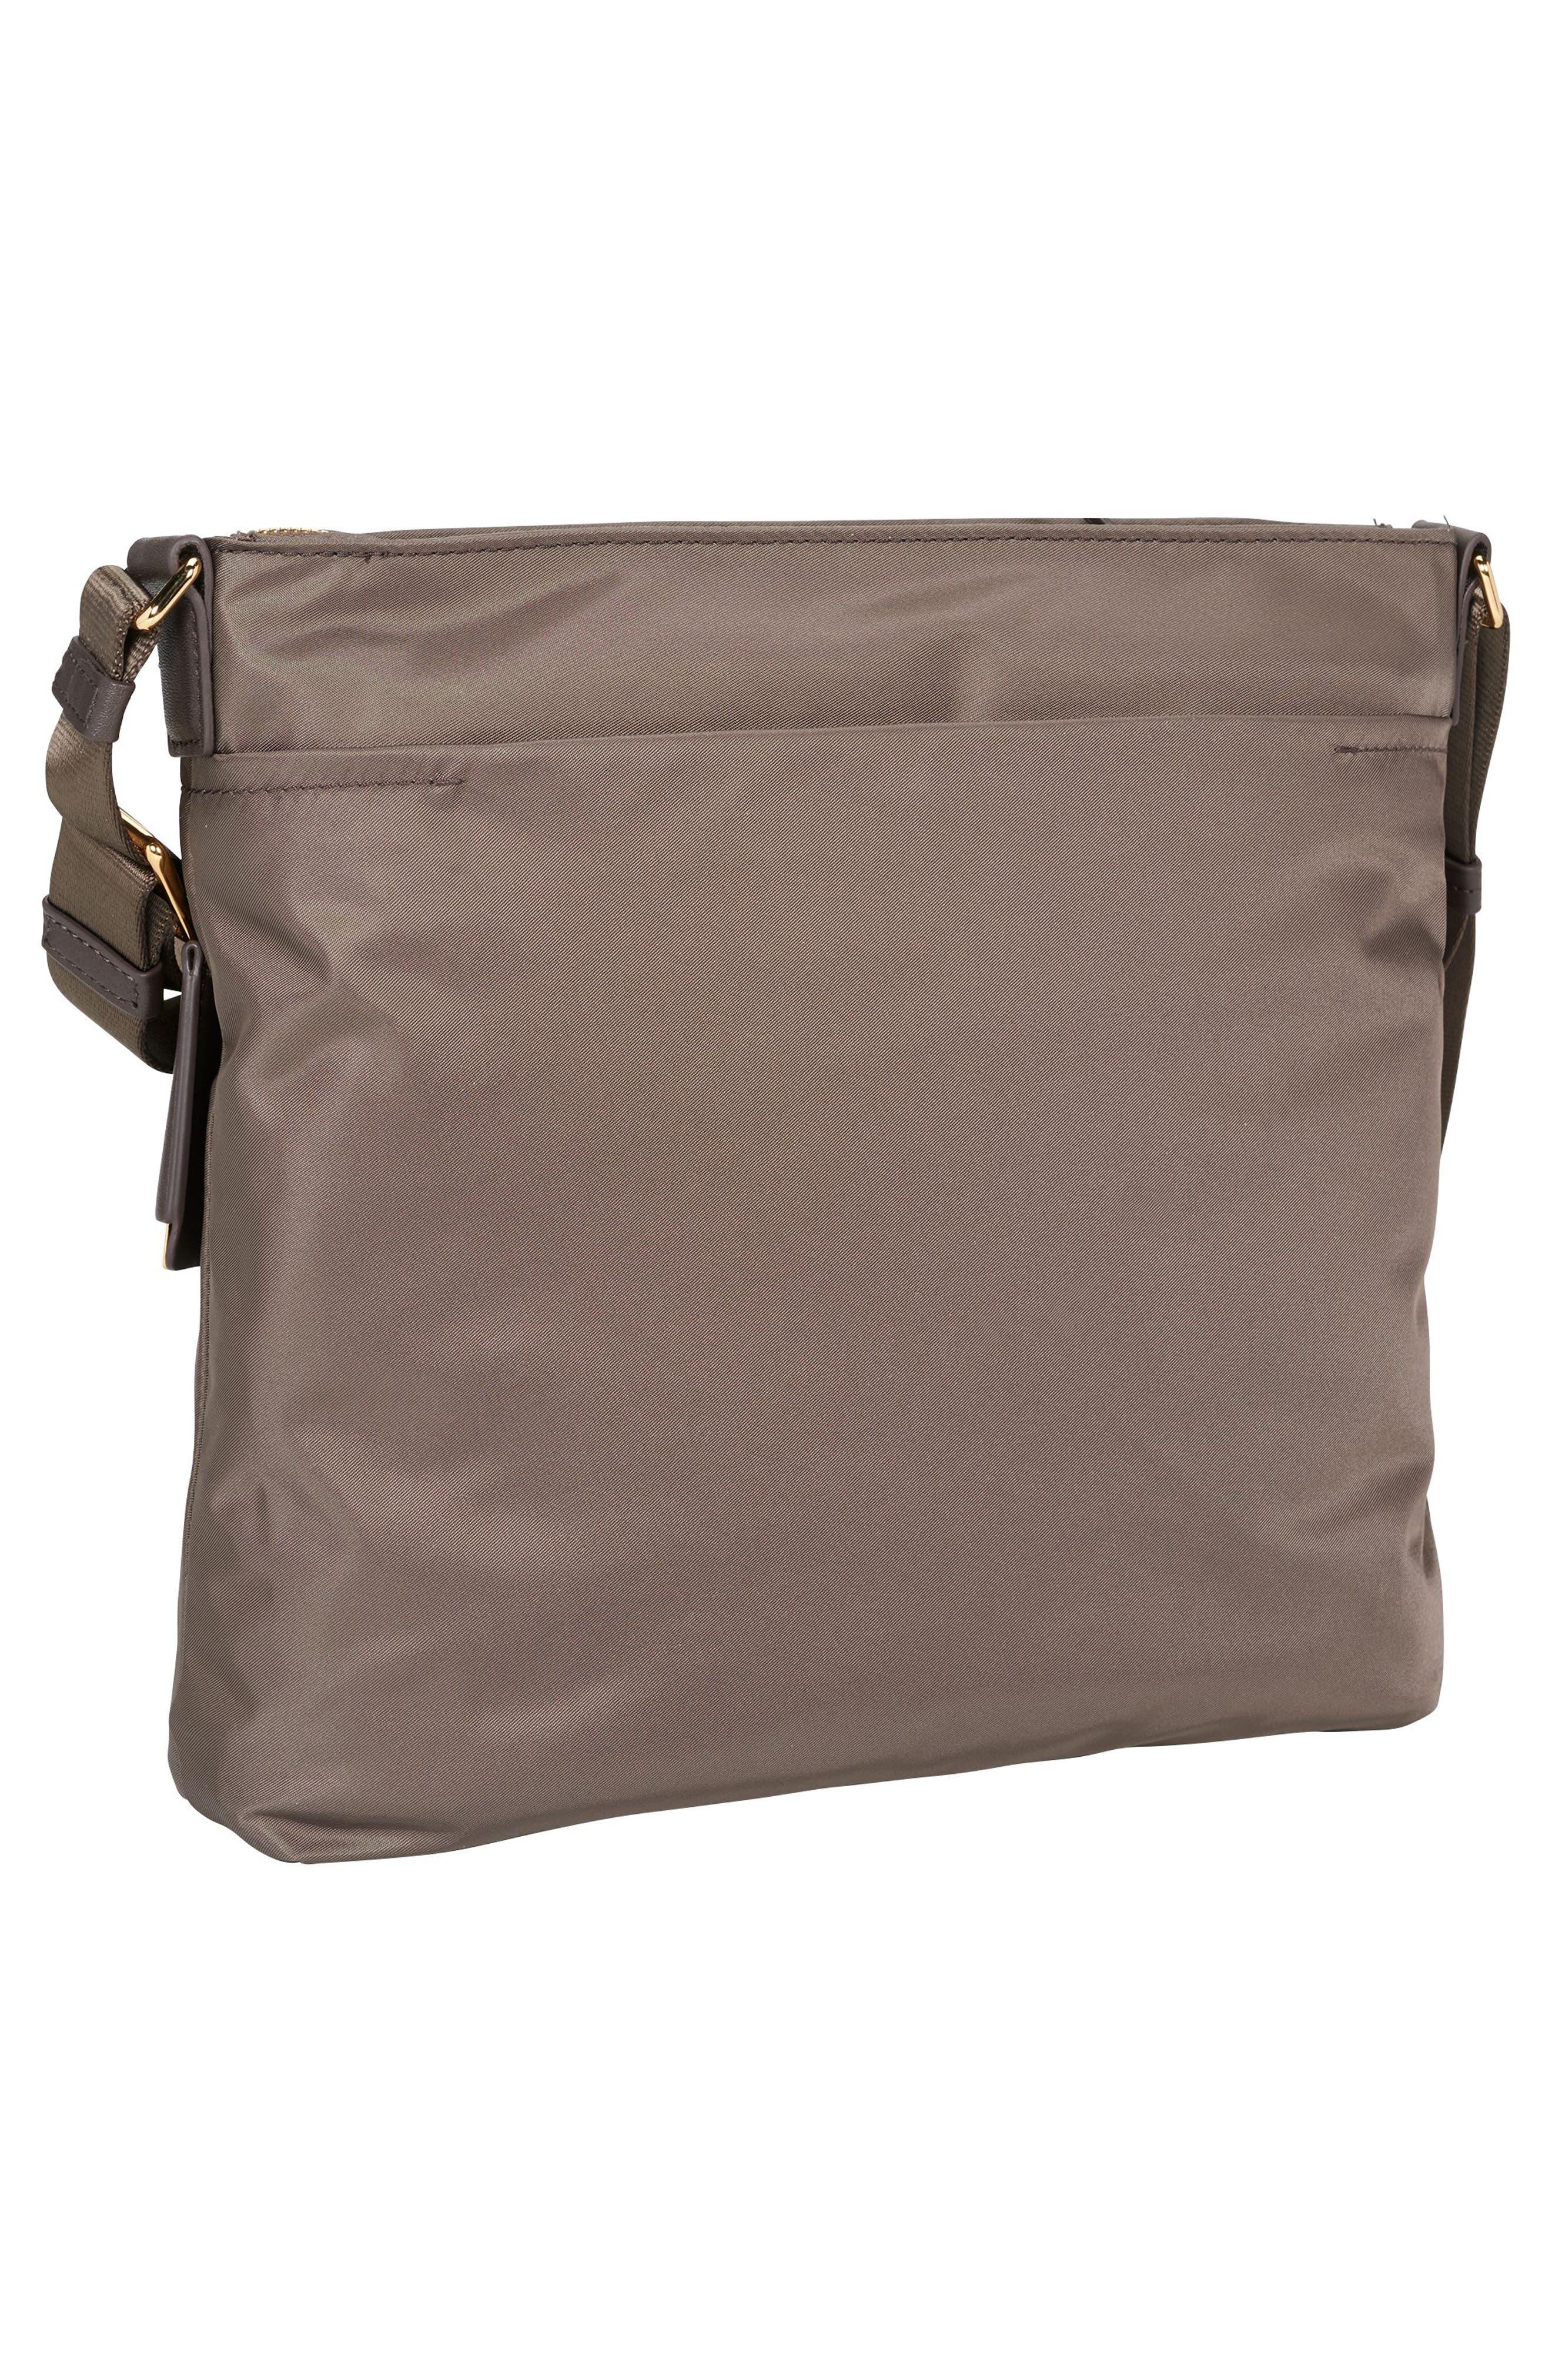 Voyageur - Capri Nylon Crossbody Bag,                             Alternate thumbnail 24, color,